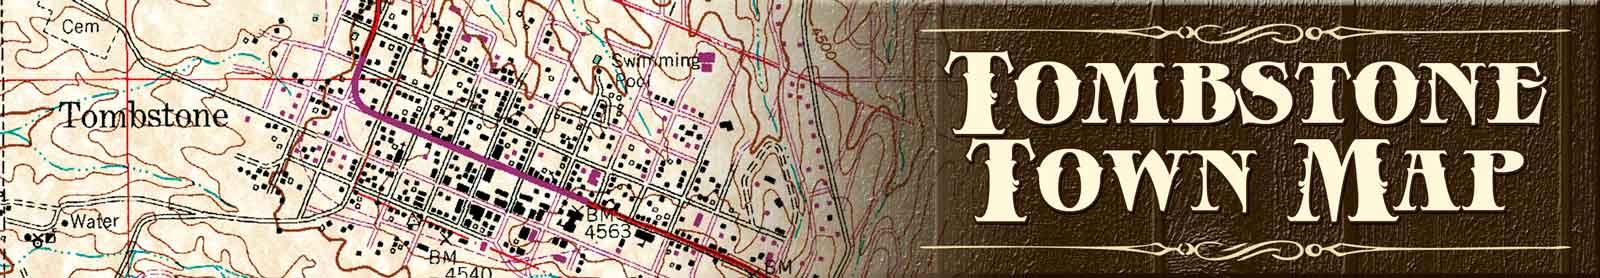 Tombstone Arizona Town Map